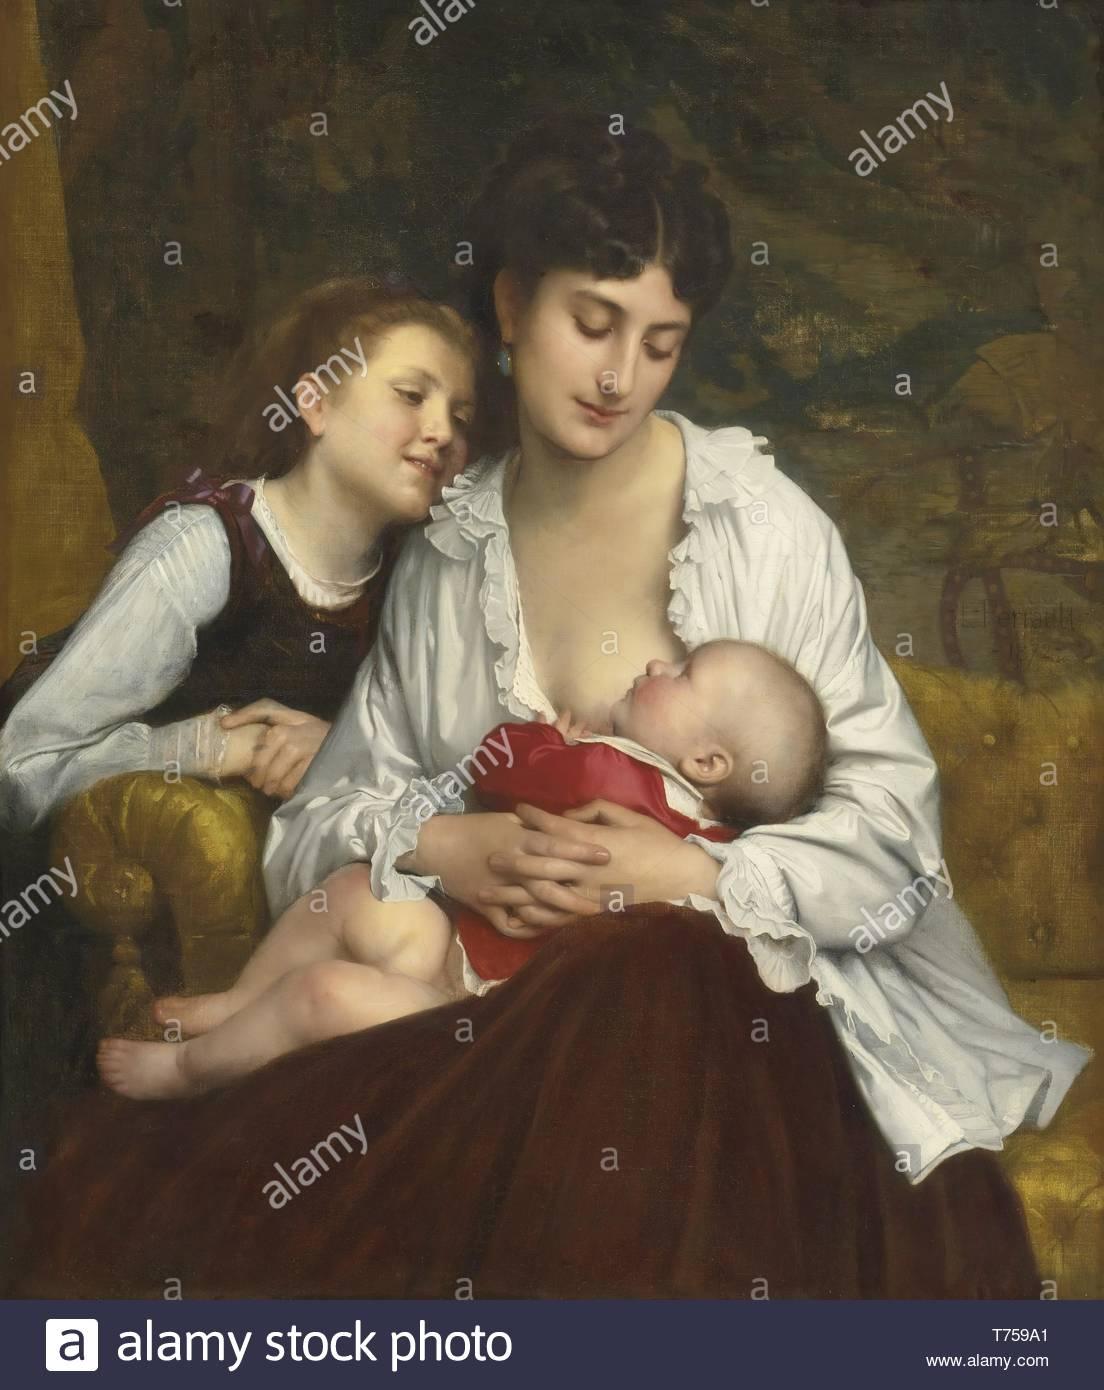 Lon-Jean-Basile Perrault-Motherly Love - Stock Image